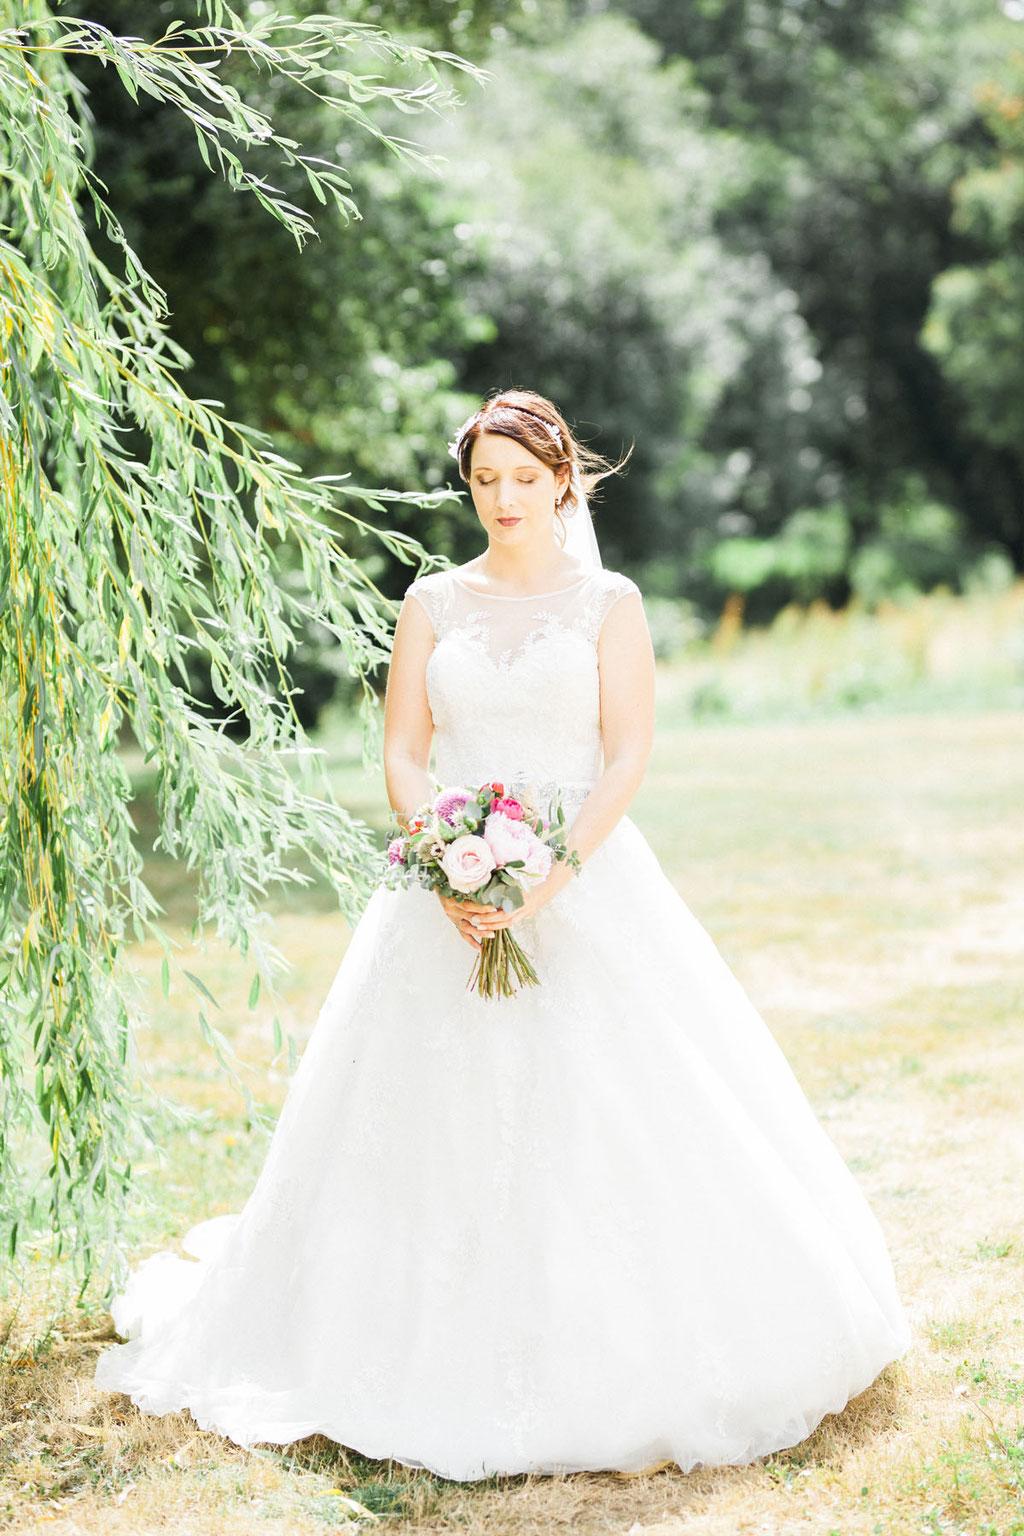 Manoir  de la fresynaye mariée mariage Bretagne Orlane Boisard mariée